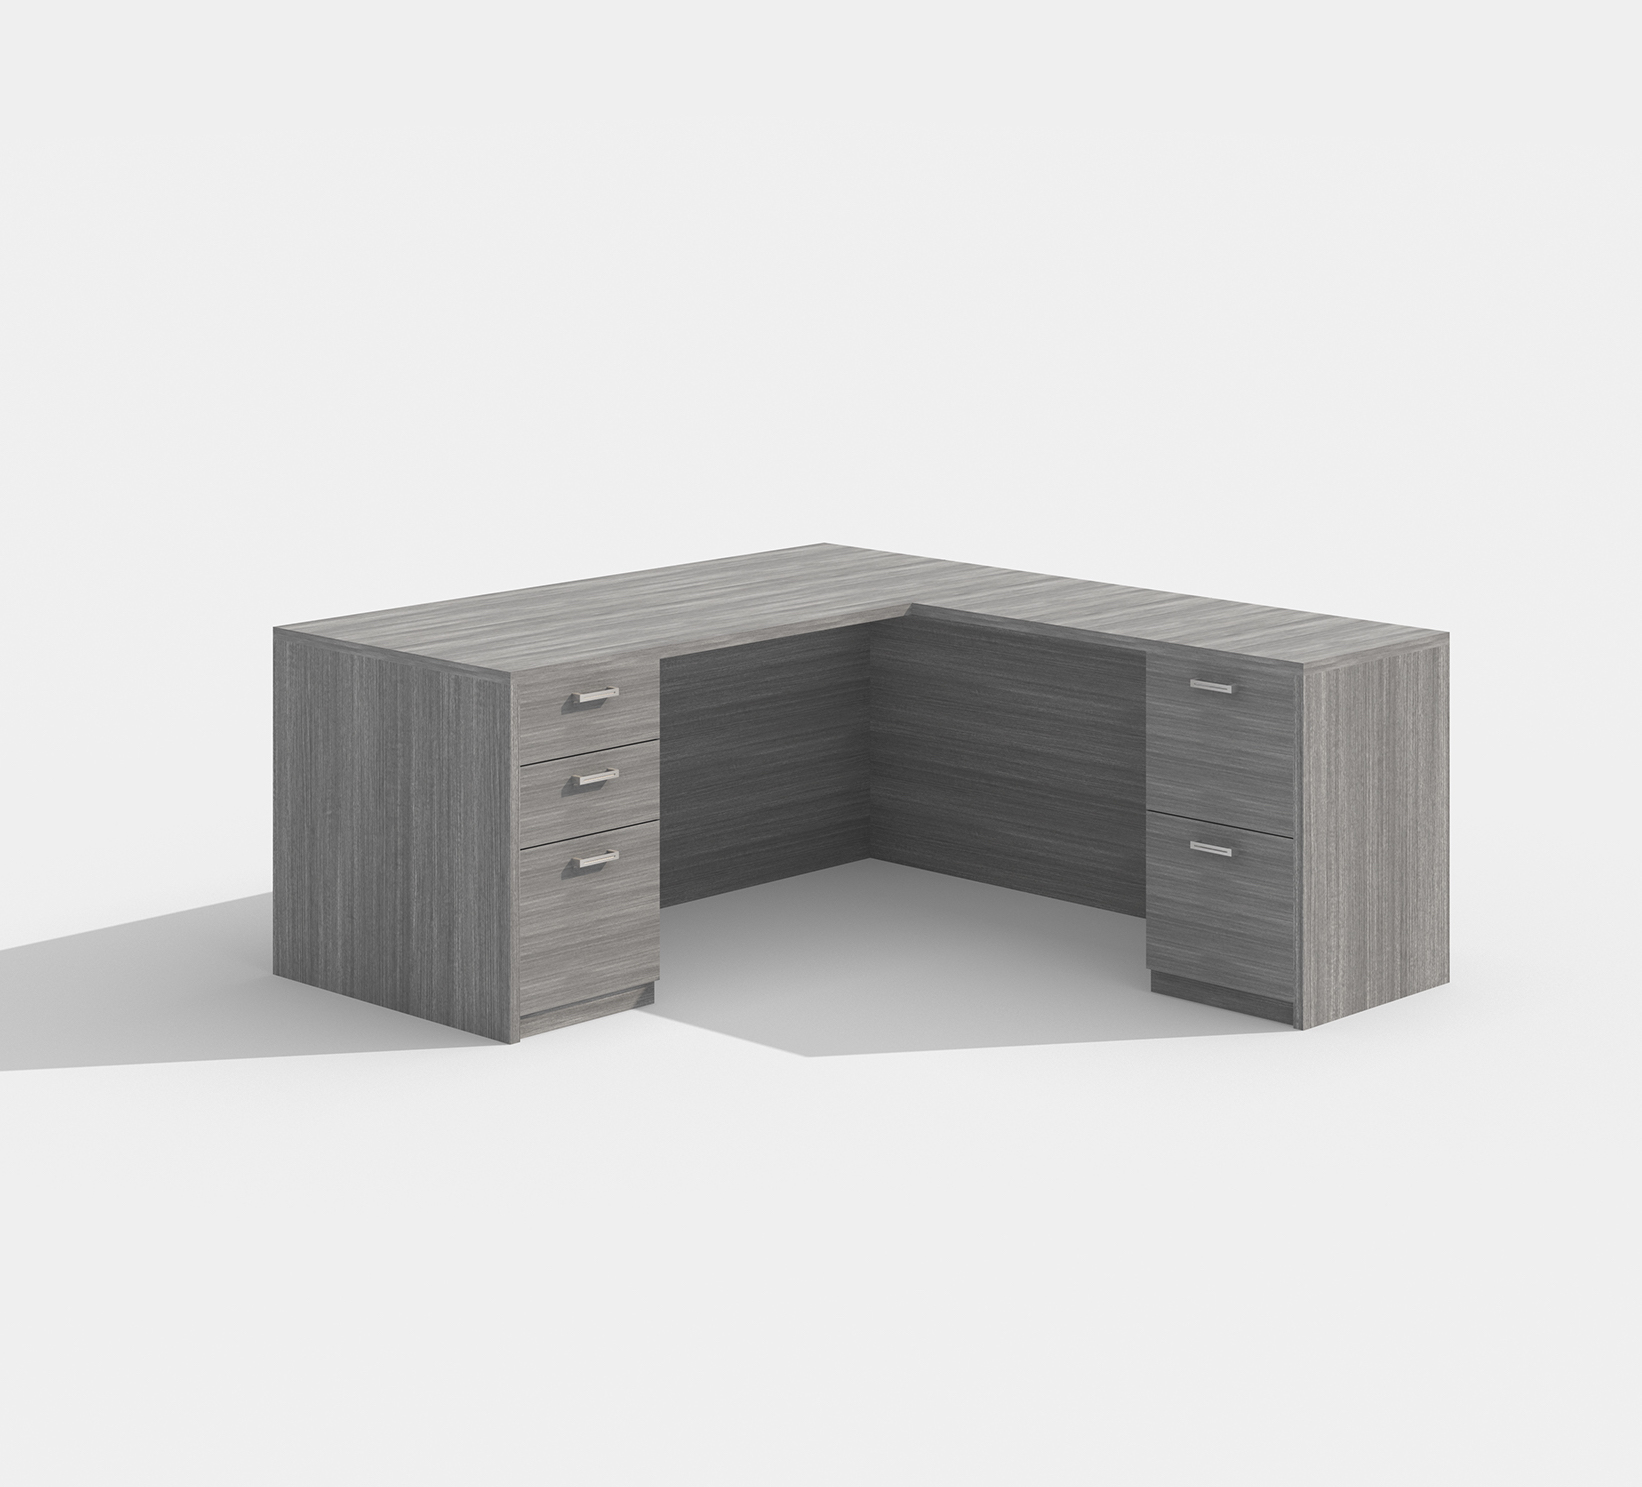 am-417n amber l-desk in gray